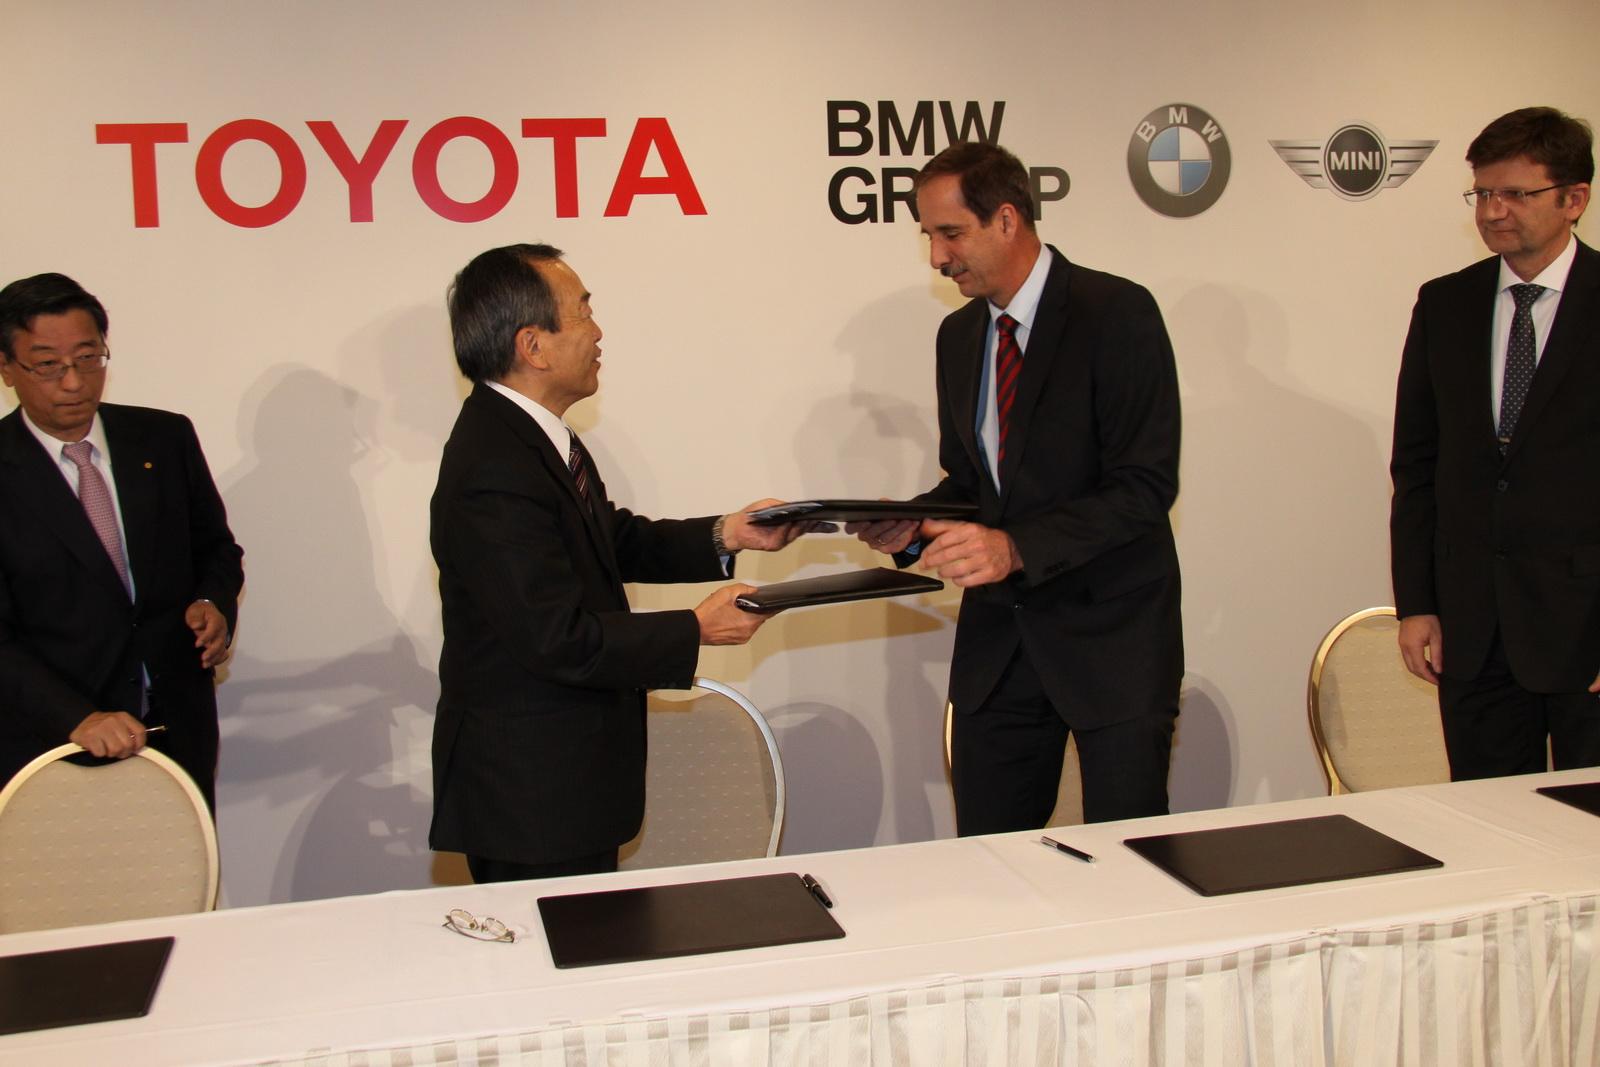 BMW-Toyota signing